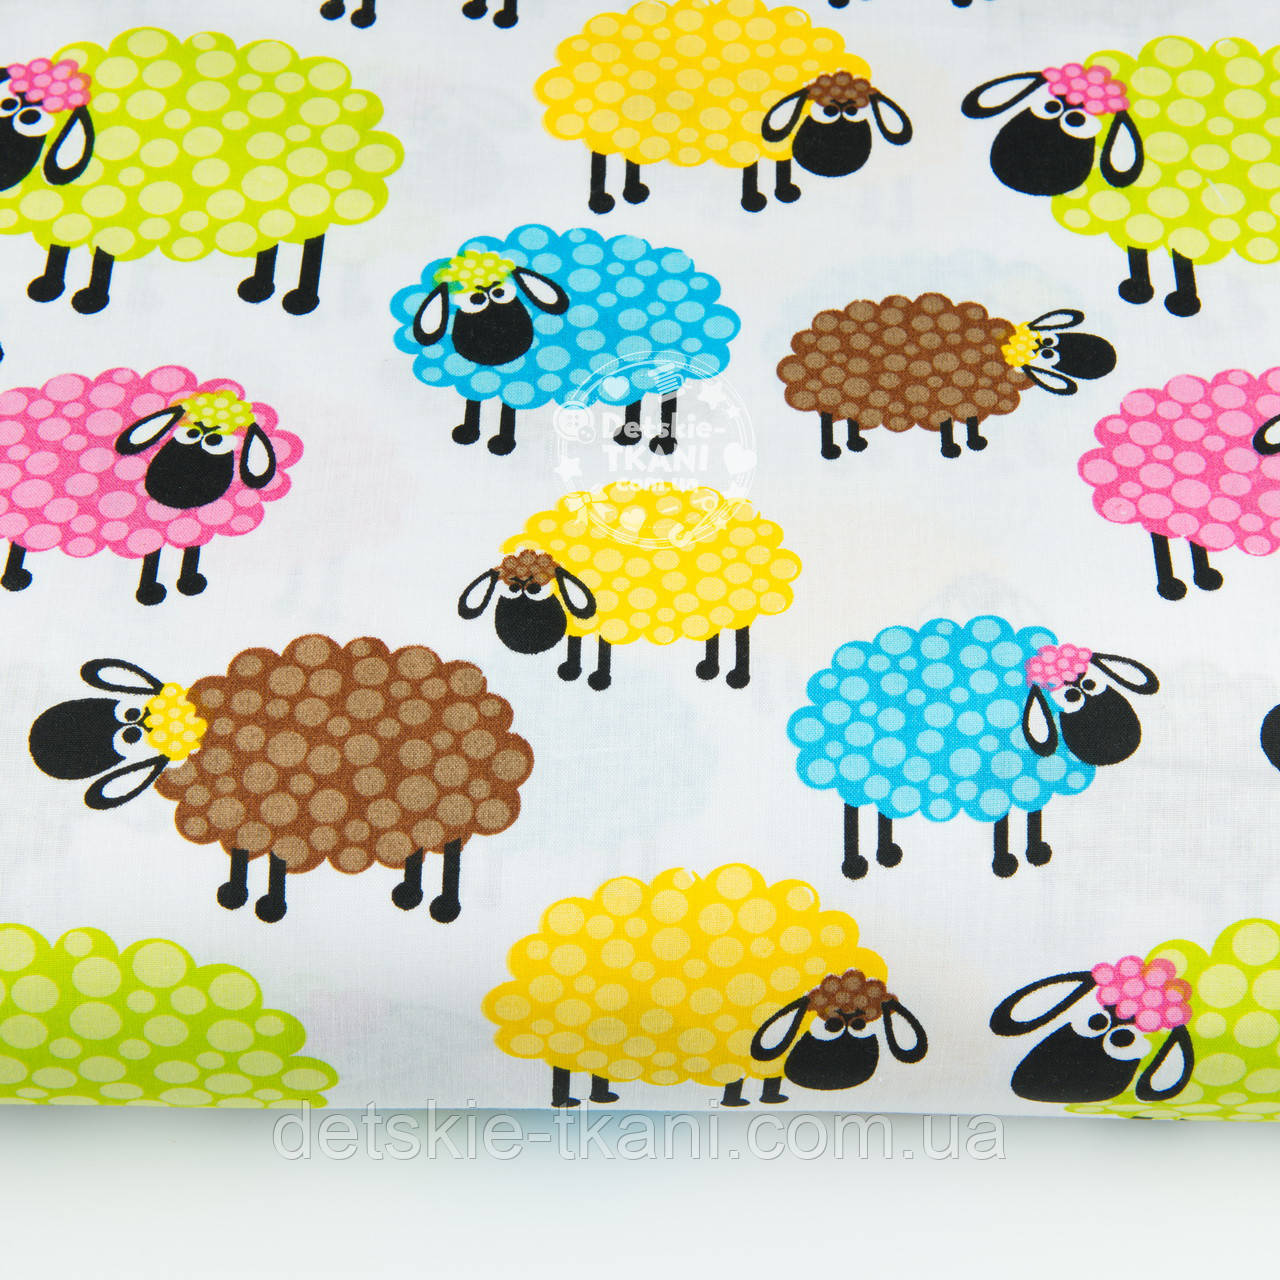 "Лоскут ткани ""Разноцветные овечки"" на белом фоне, № 1415а"